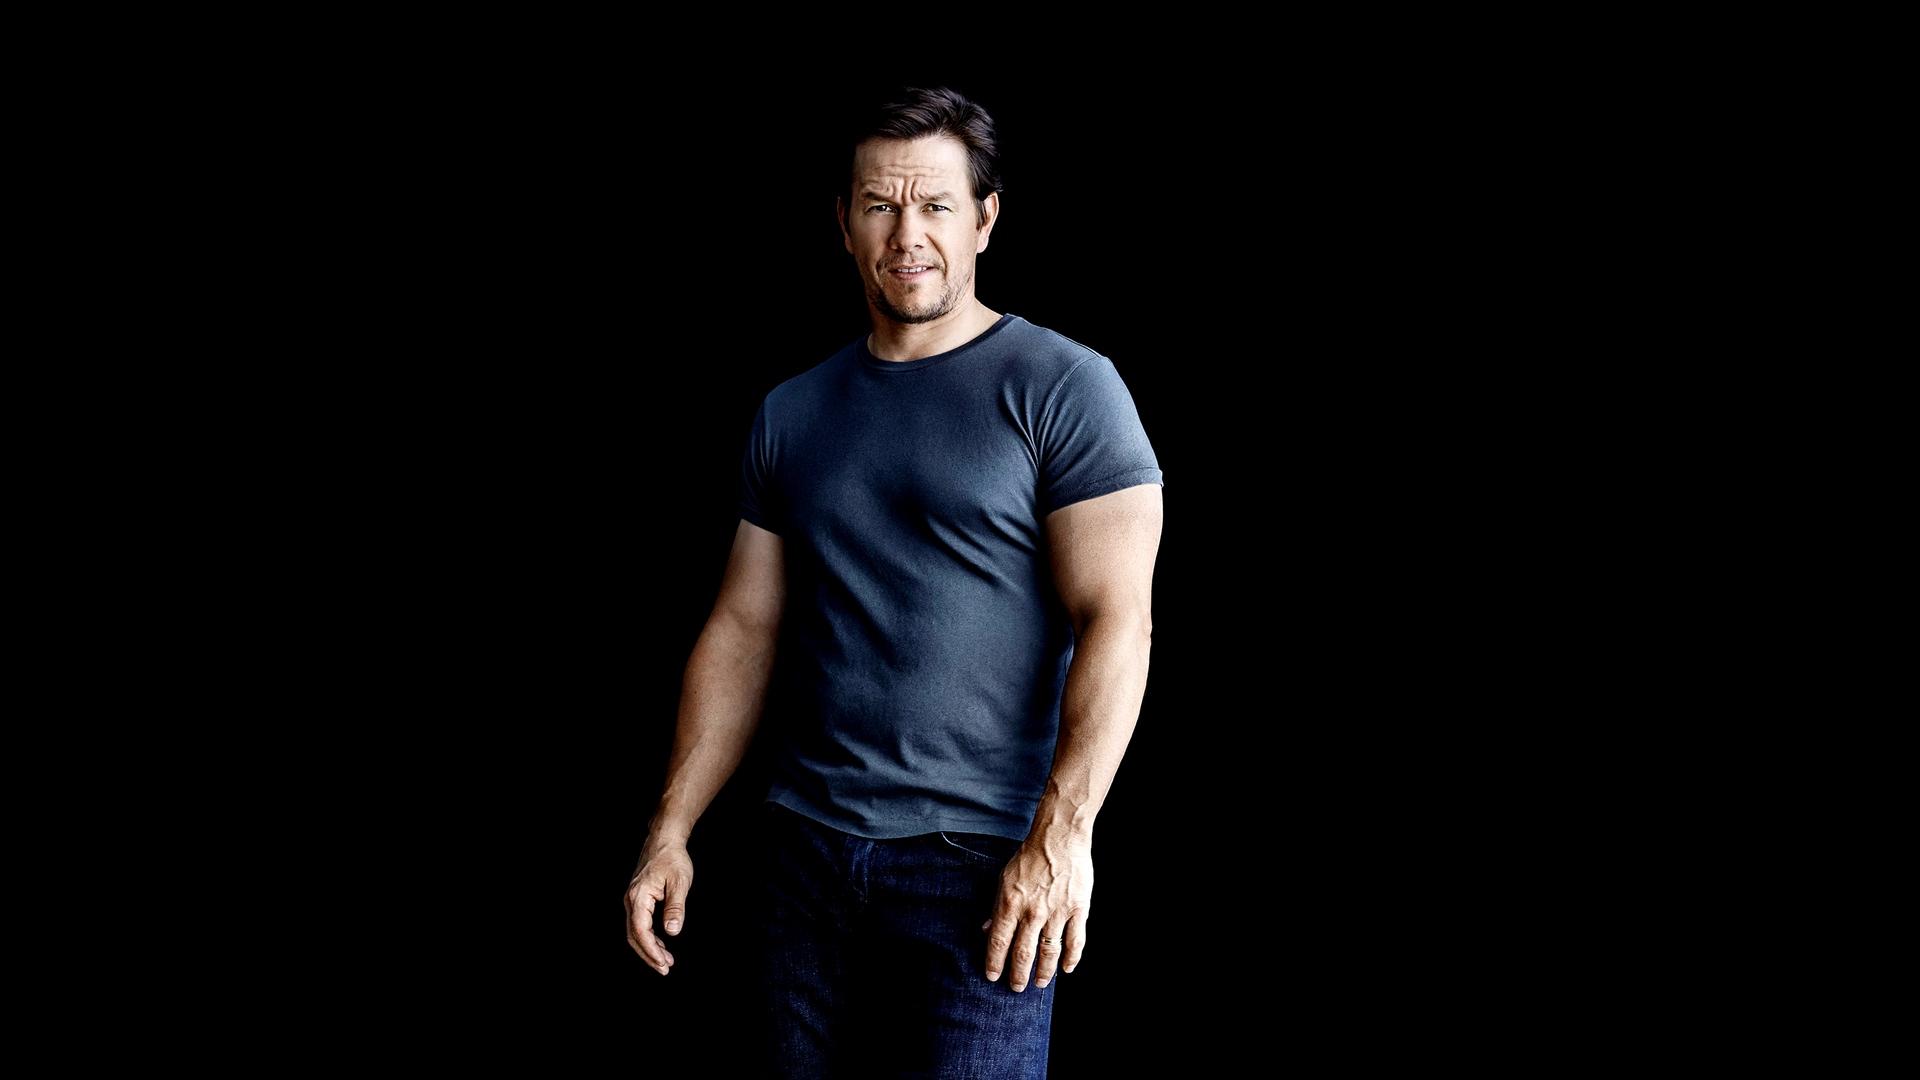 Mark Wahlberg High Definition Wallpaper 38854   Baltana 1920x1080